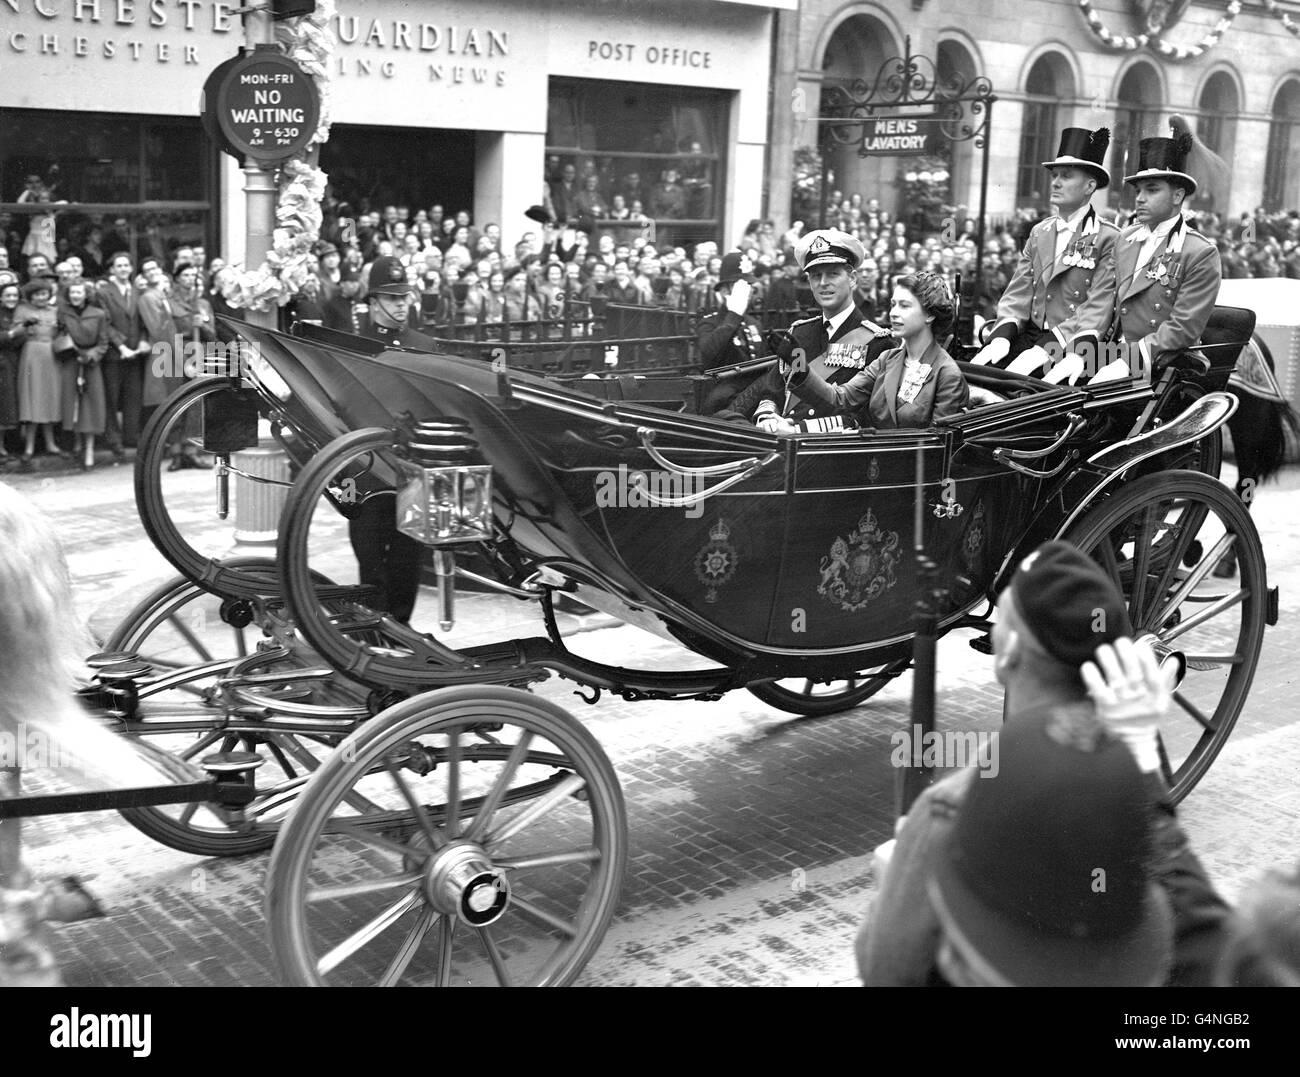 London - Stock Image